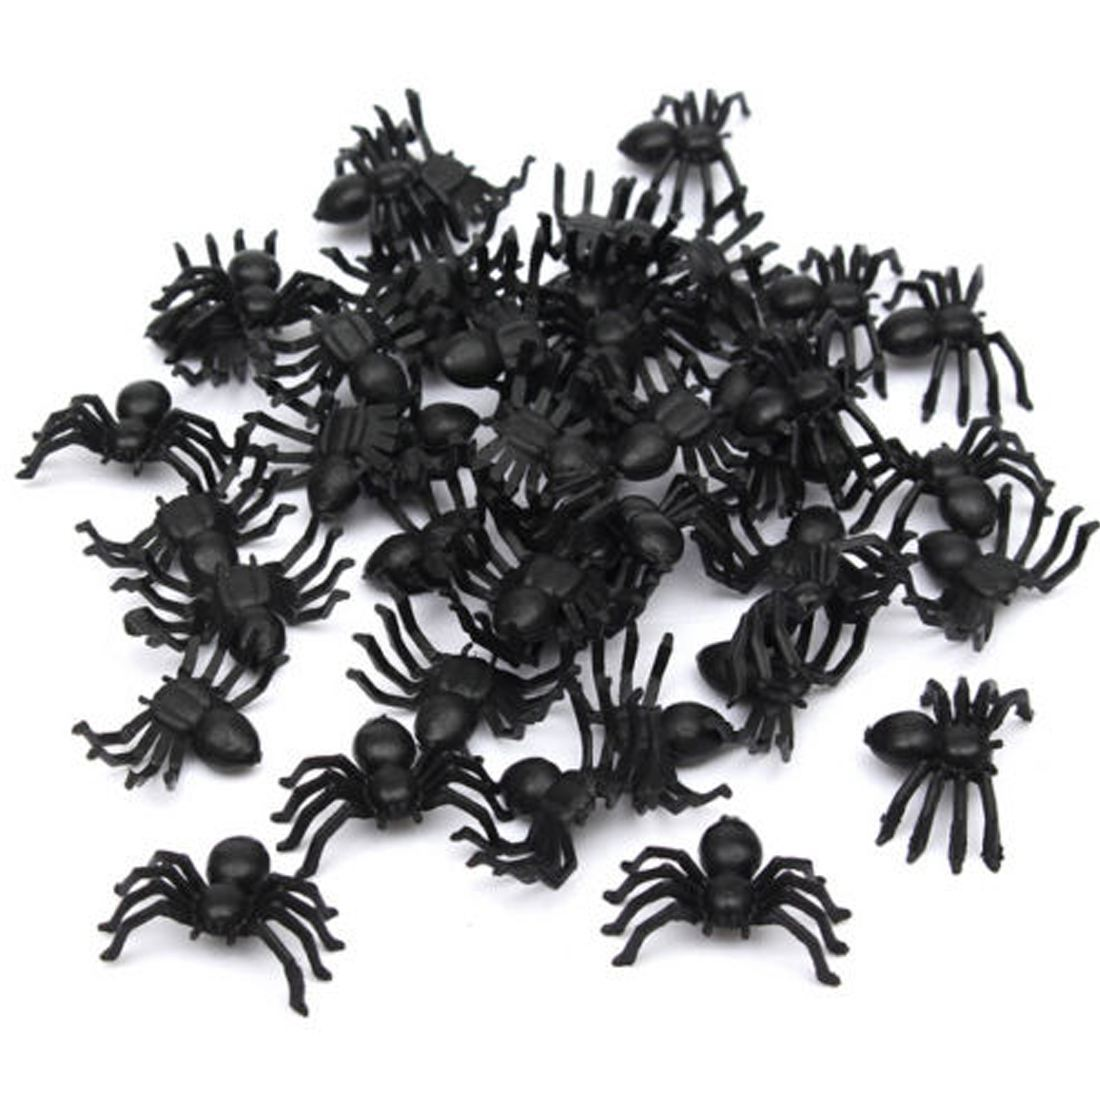 50pcs 2*1.4cm Plastic Black Spider Halloween Decoration Festival Supplies Funny Prank Toys Decoration Realistic Prop